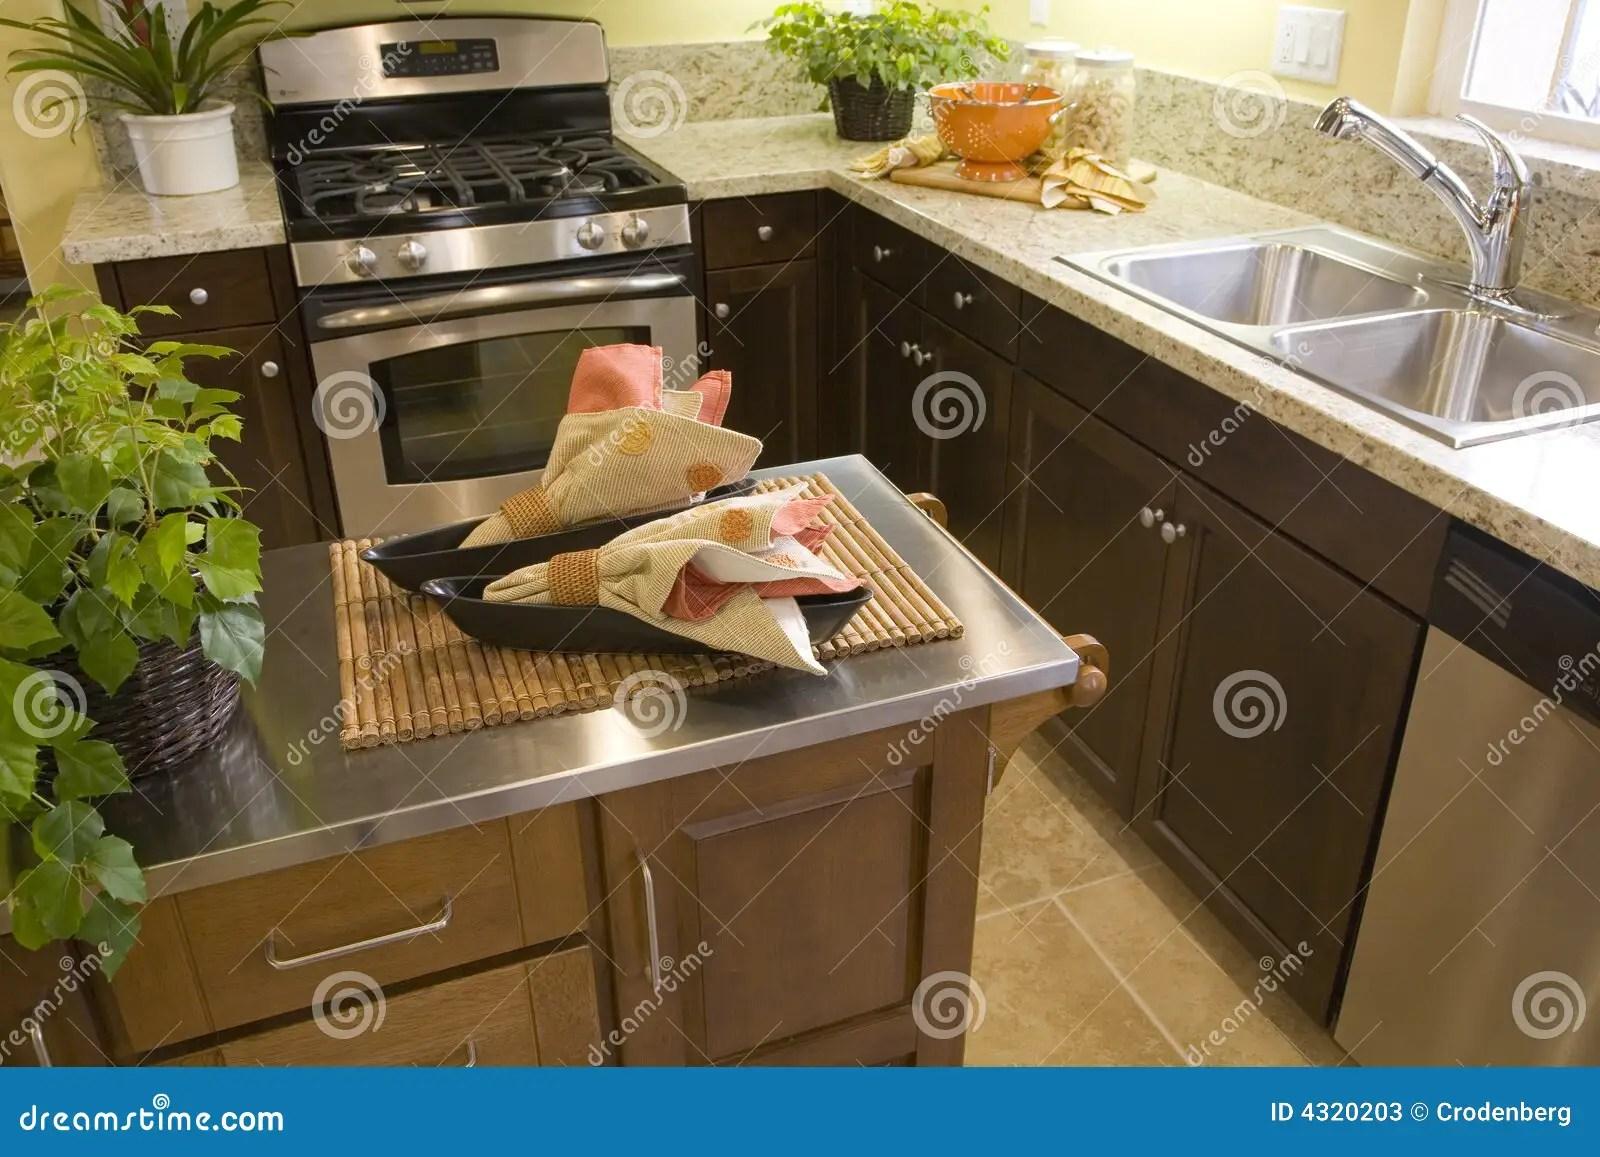 kitchen aid ovens cat 家庭厨房豪华库存图片 图片包括有烤箱 豪宅 家具 设计员 改善 内部 家庭厨房豪华